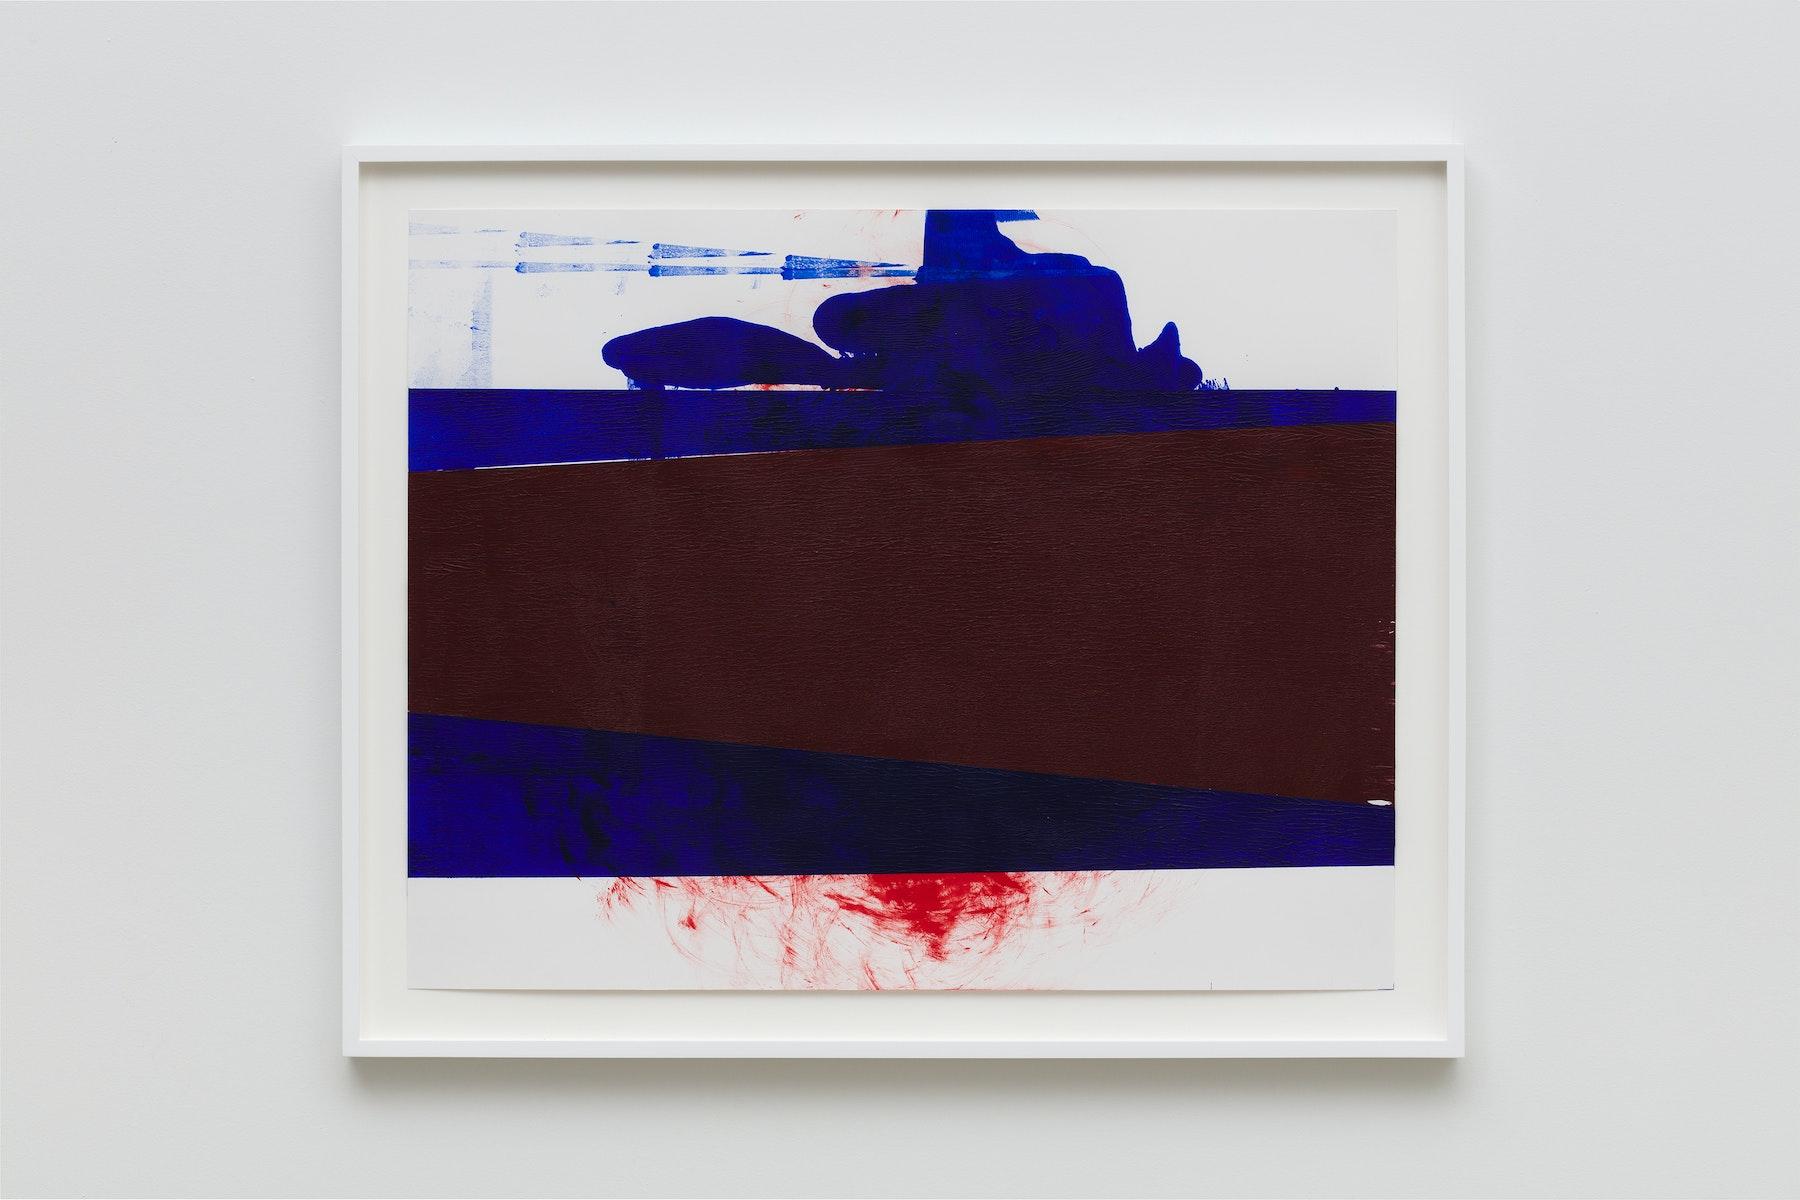 "Elizabeth Neel ""US 29,"" 2019 Acrylic on paper 22.5 x 28.5"" [HxW] (57.15 x 72.39 cm) Inventory #NEE245 Courtesy of the artist and Vielmetter Los Angeles Photo credit: Jeff McLane"